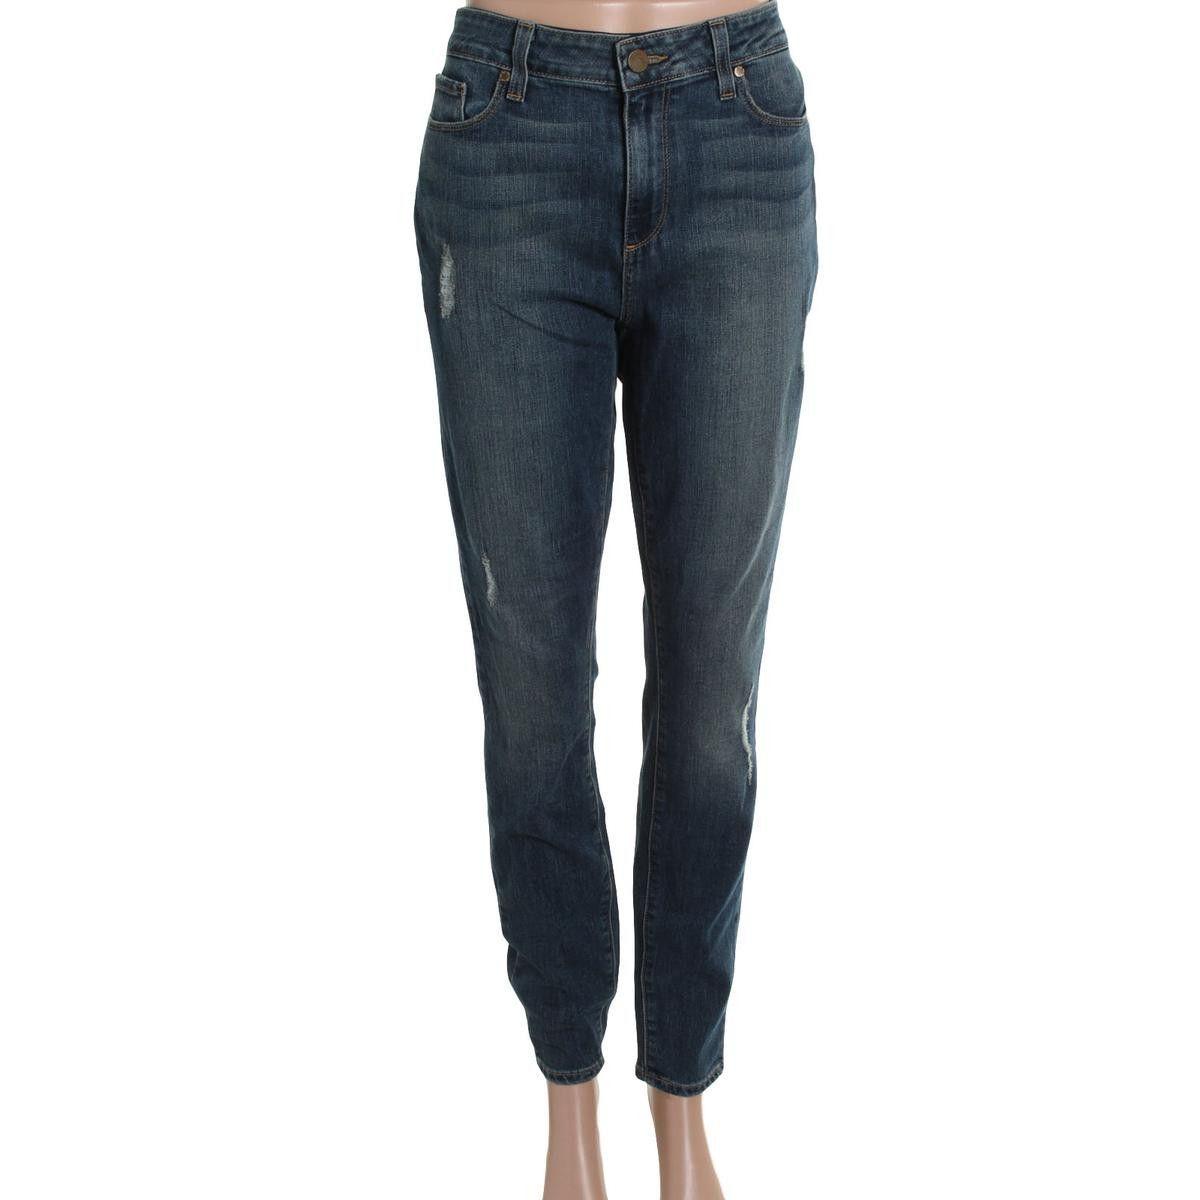 Paige Womens Juniors Hoxton Medium Wash Denim Skinny Jeans